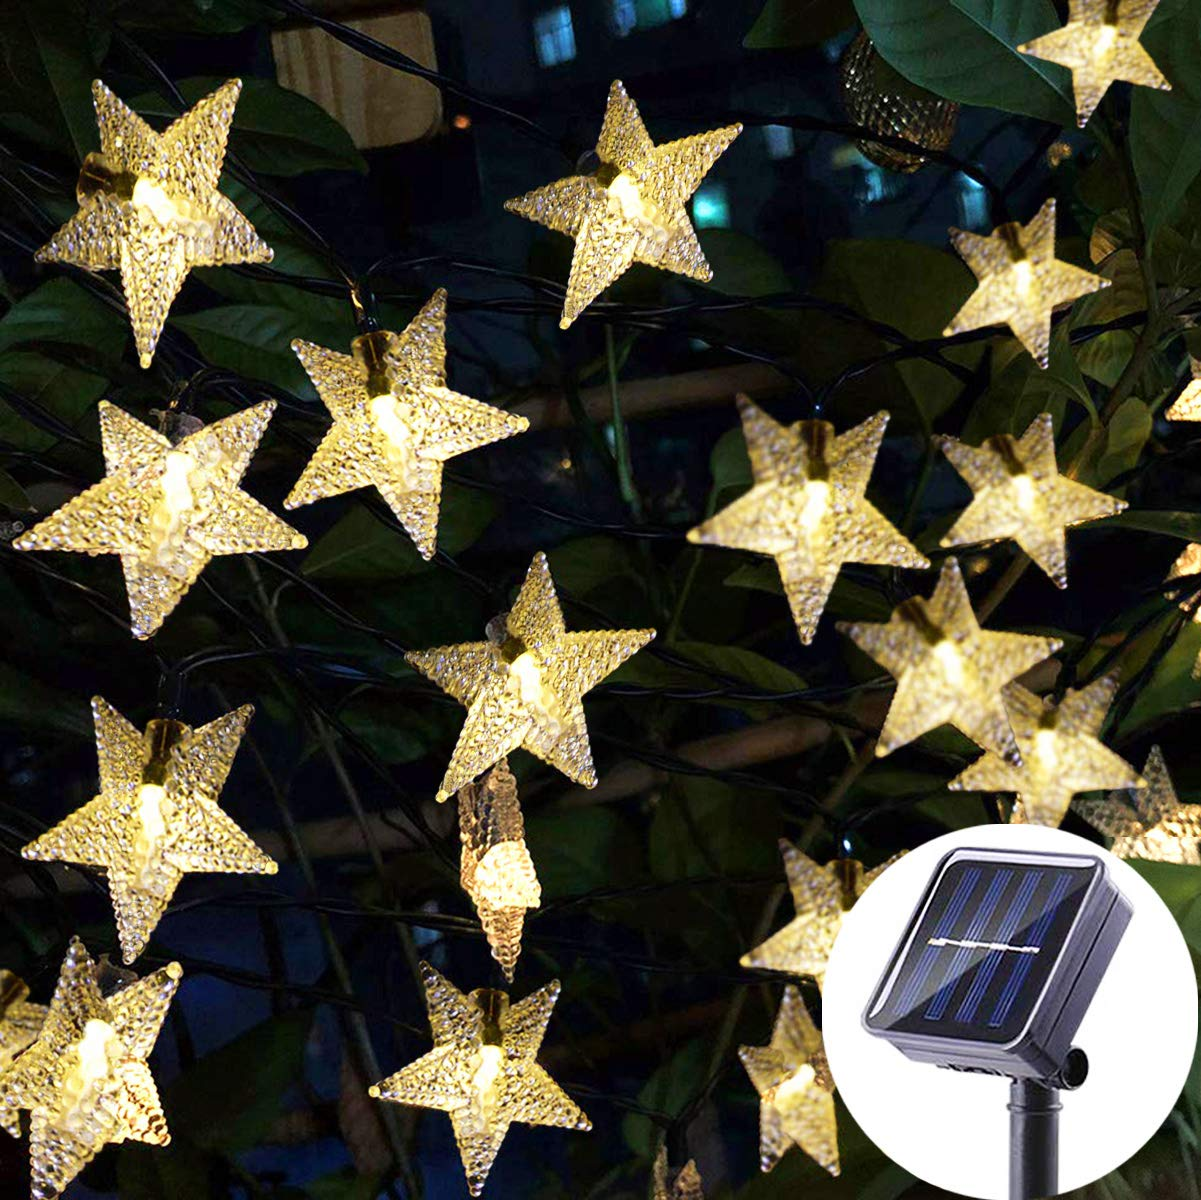 LED Solar String Light 6m 50LEDS Solar Star String Fairy Light Outdoor Garden Christmas Party Decoration Solar Lights